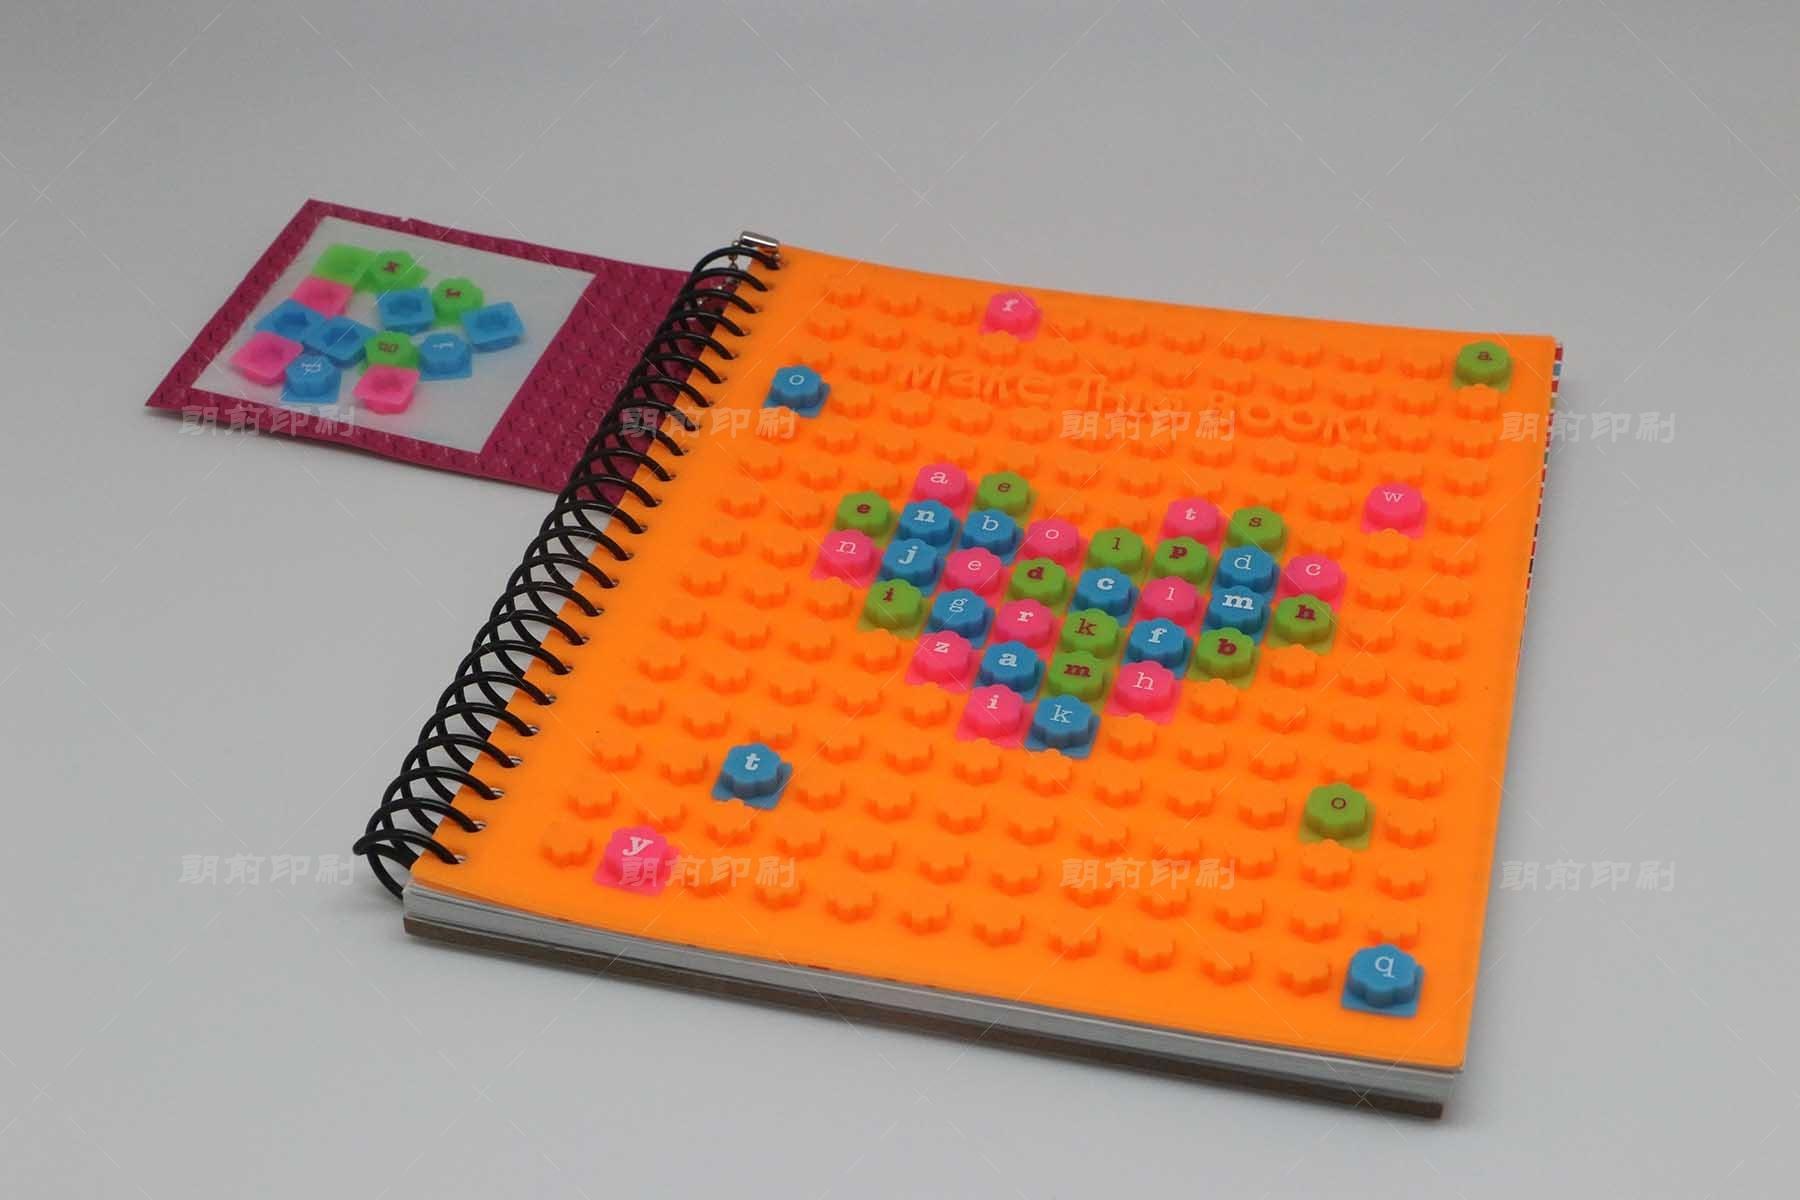 MAKE THIO BOOK 双线圈YO儿童书印刷